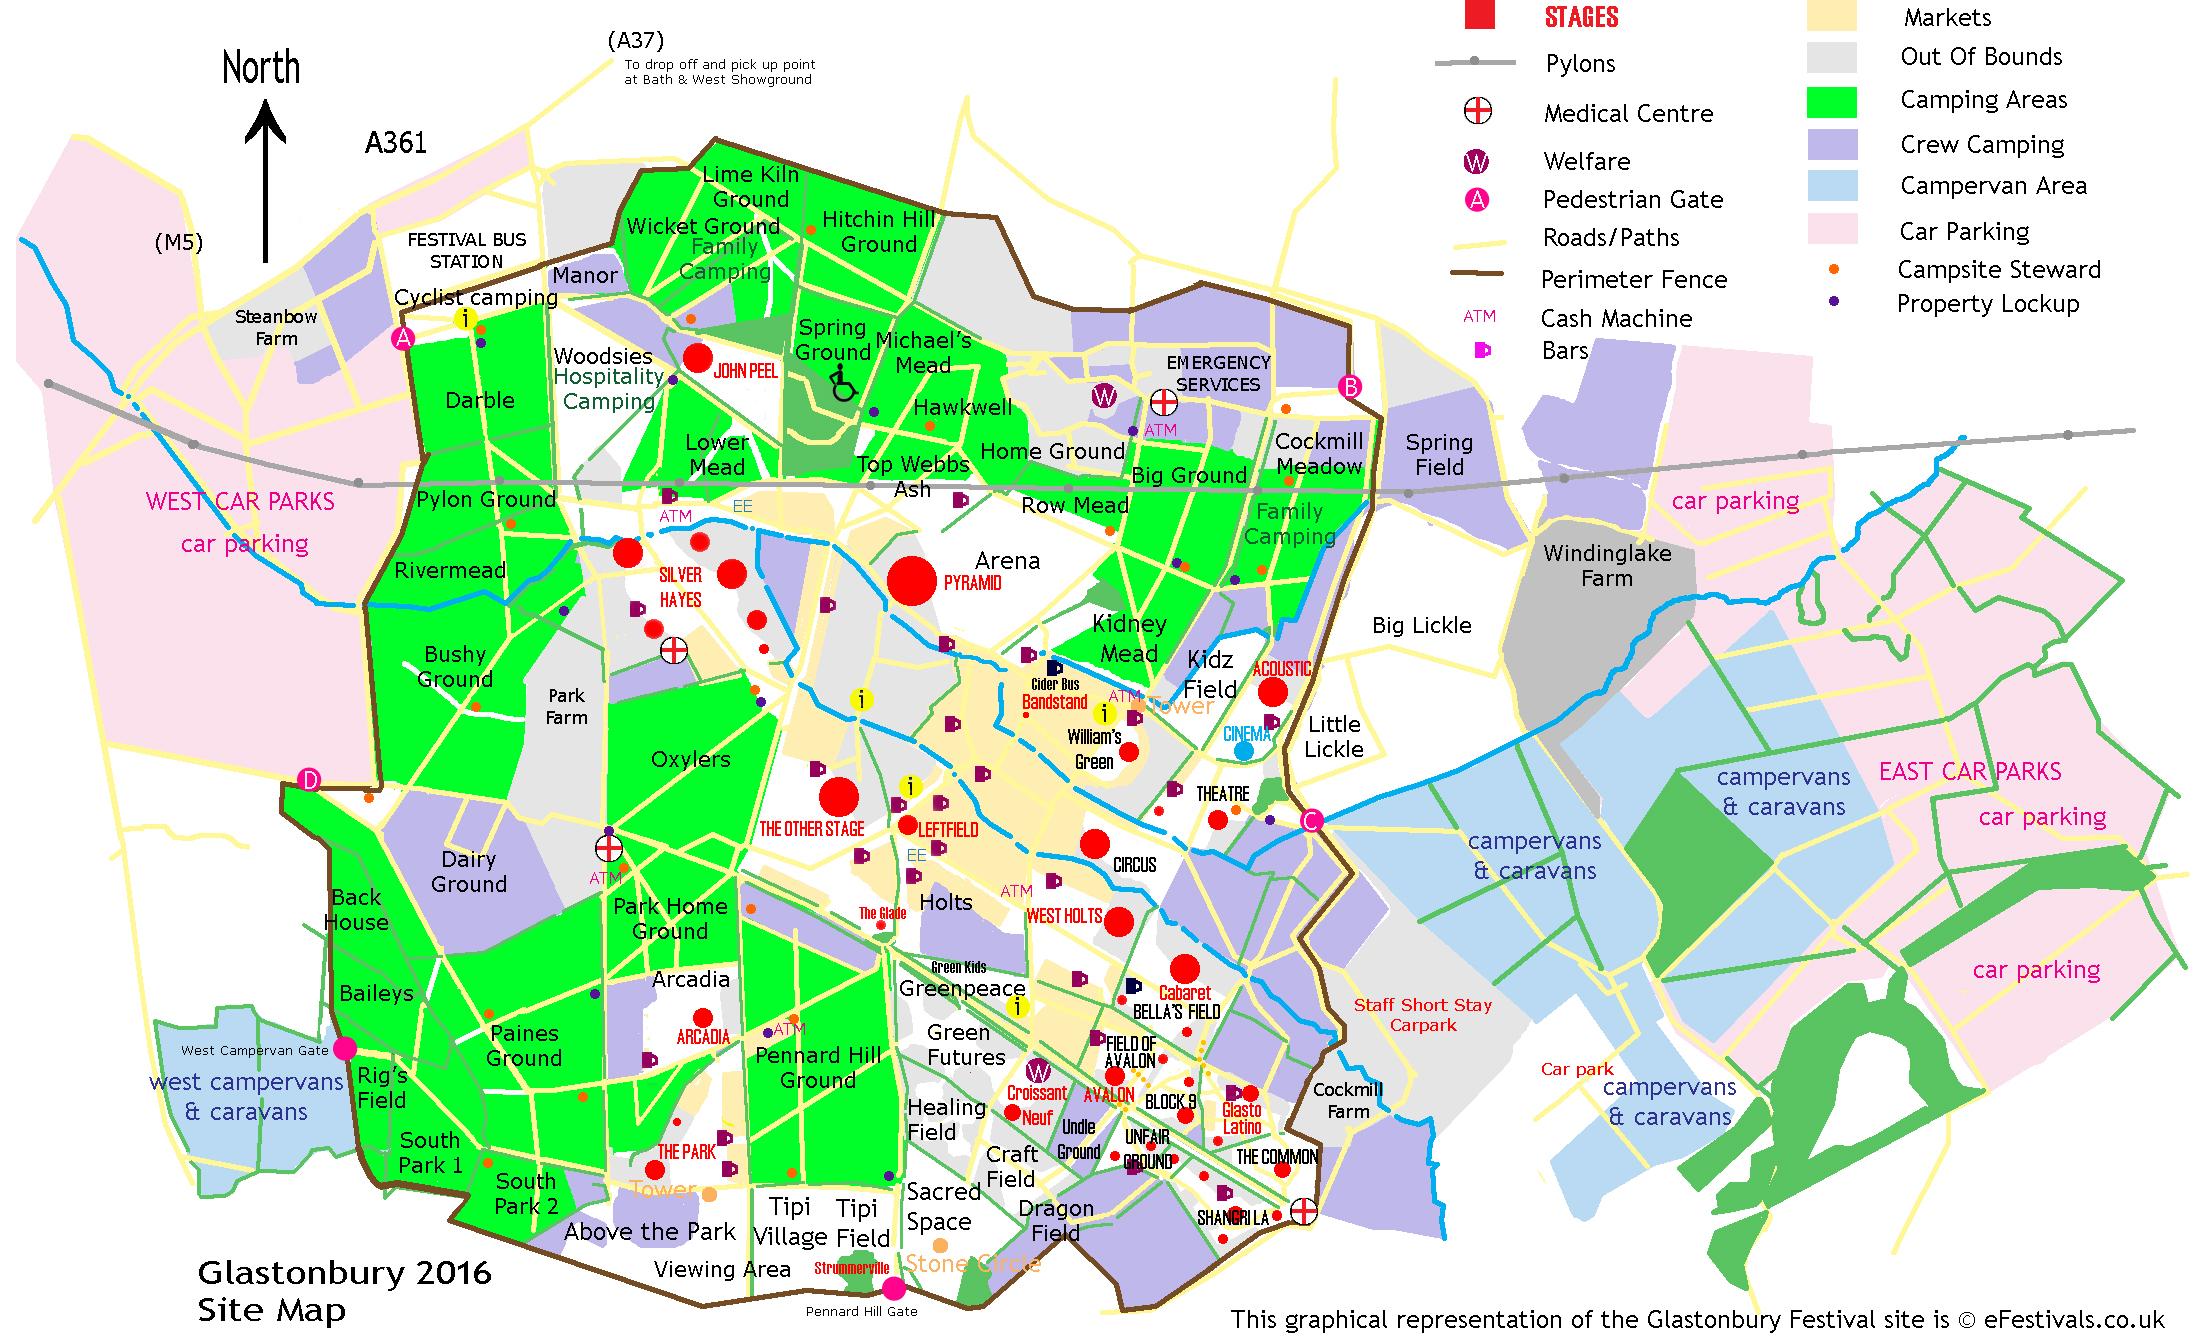 Glastonbury Festival Map Glastonbury Festival 2016 Site Map   eFestivals.co.uk Glastonbury Festival Map